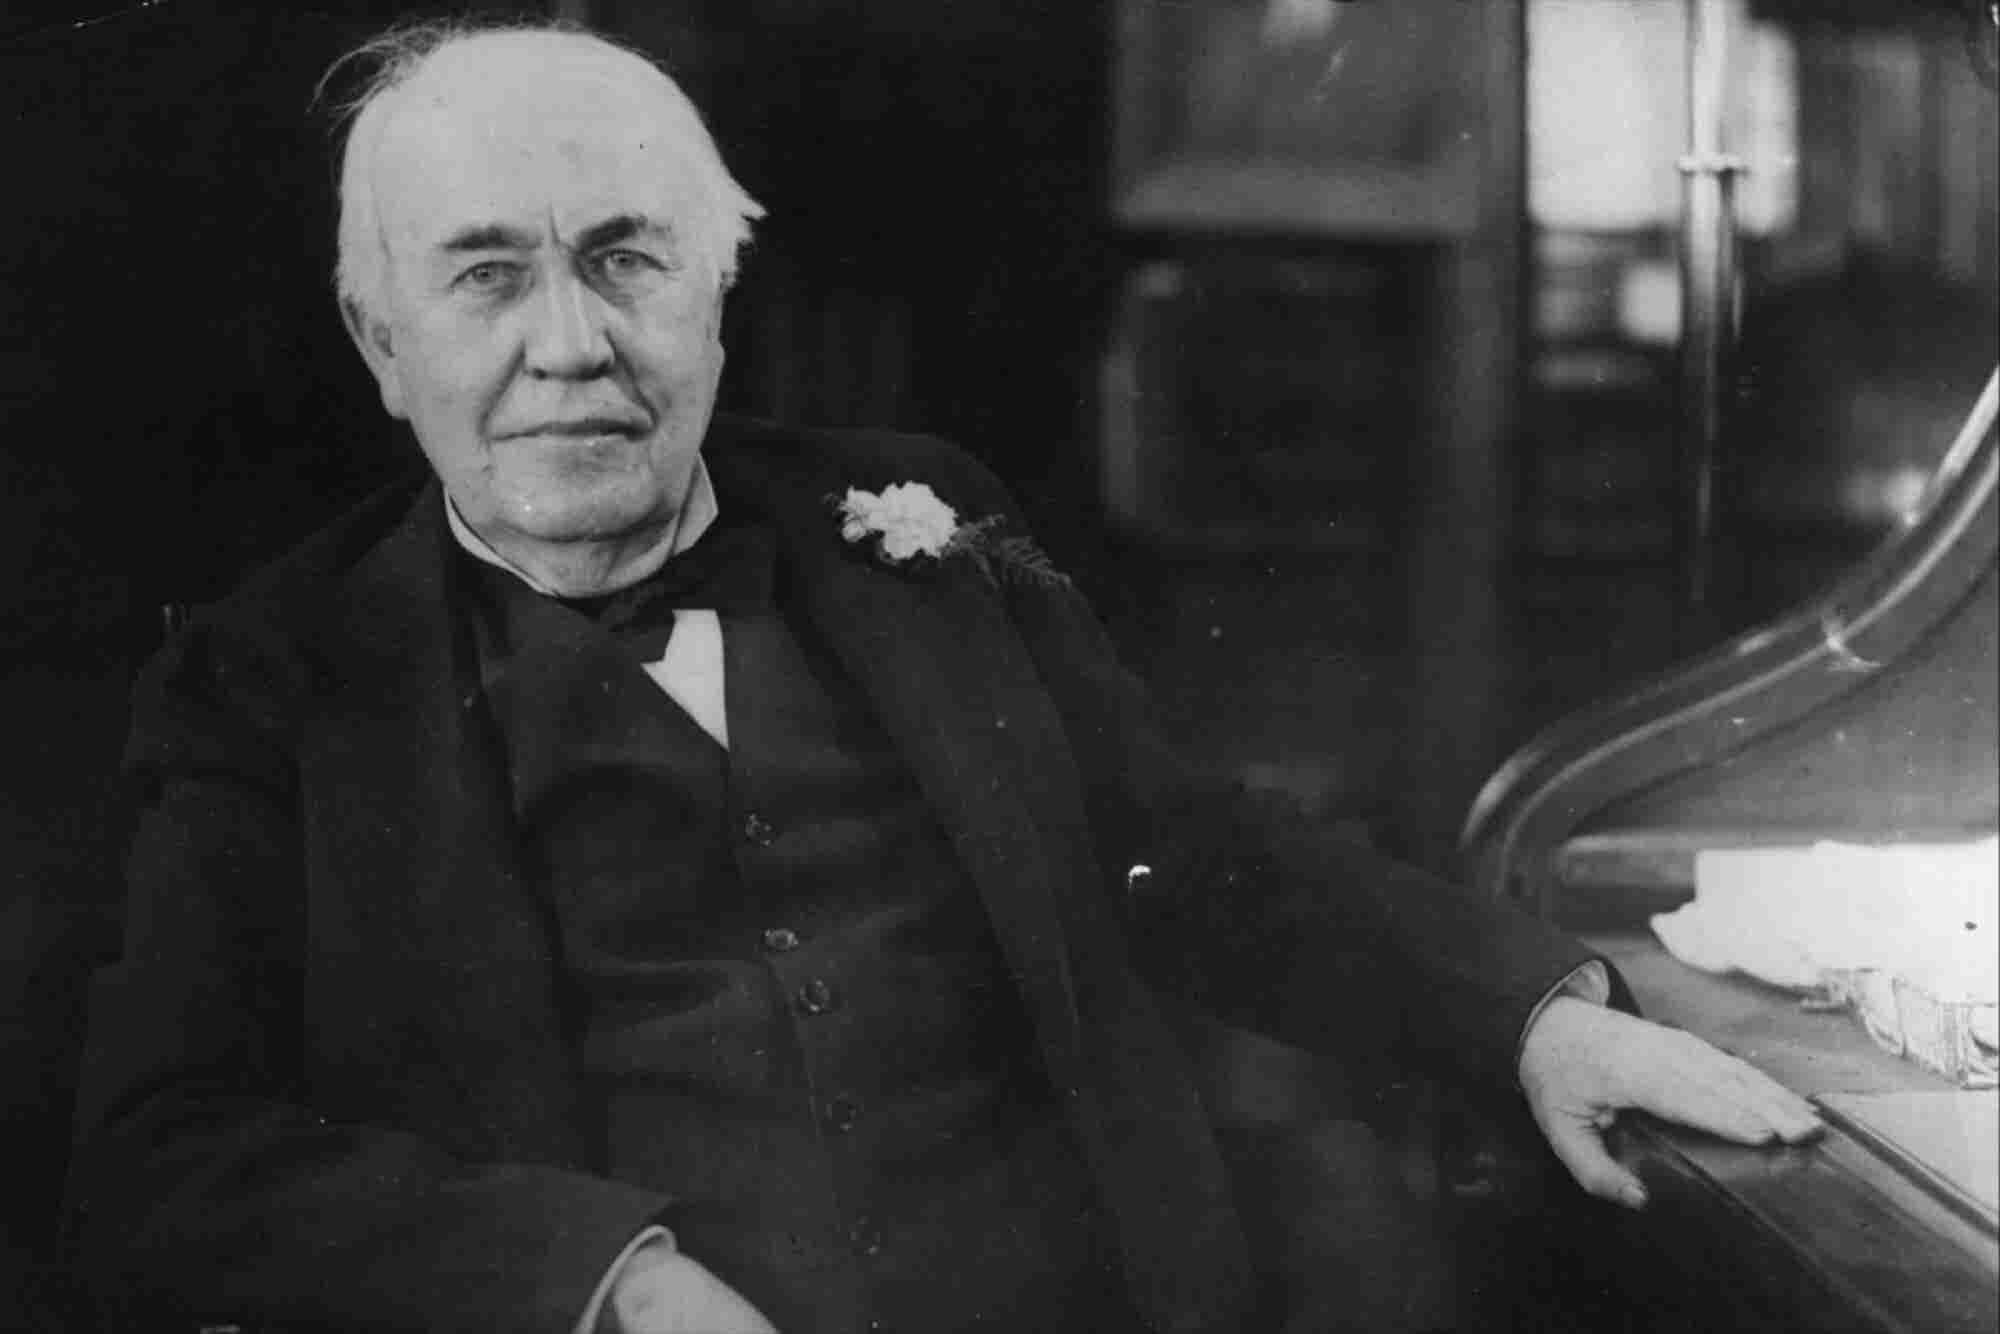 8 Facts to Amaze and Inspire On Thomas Edison's Birthday